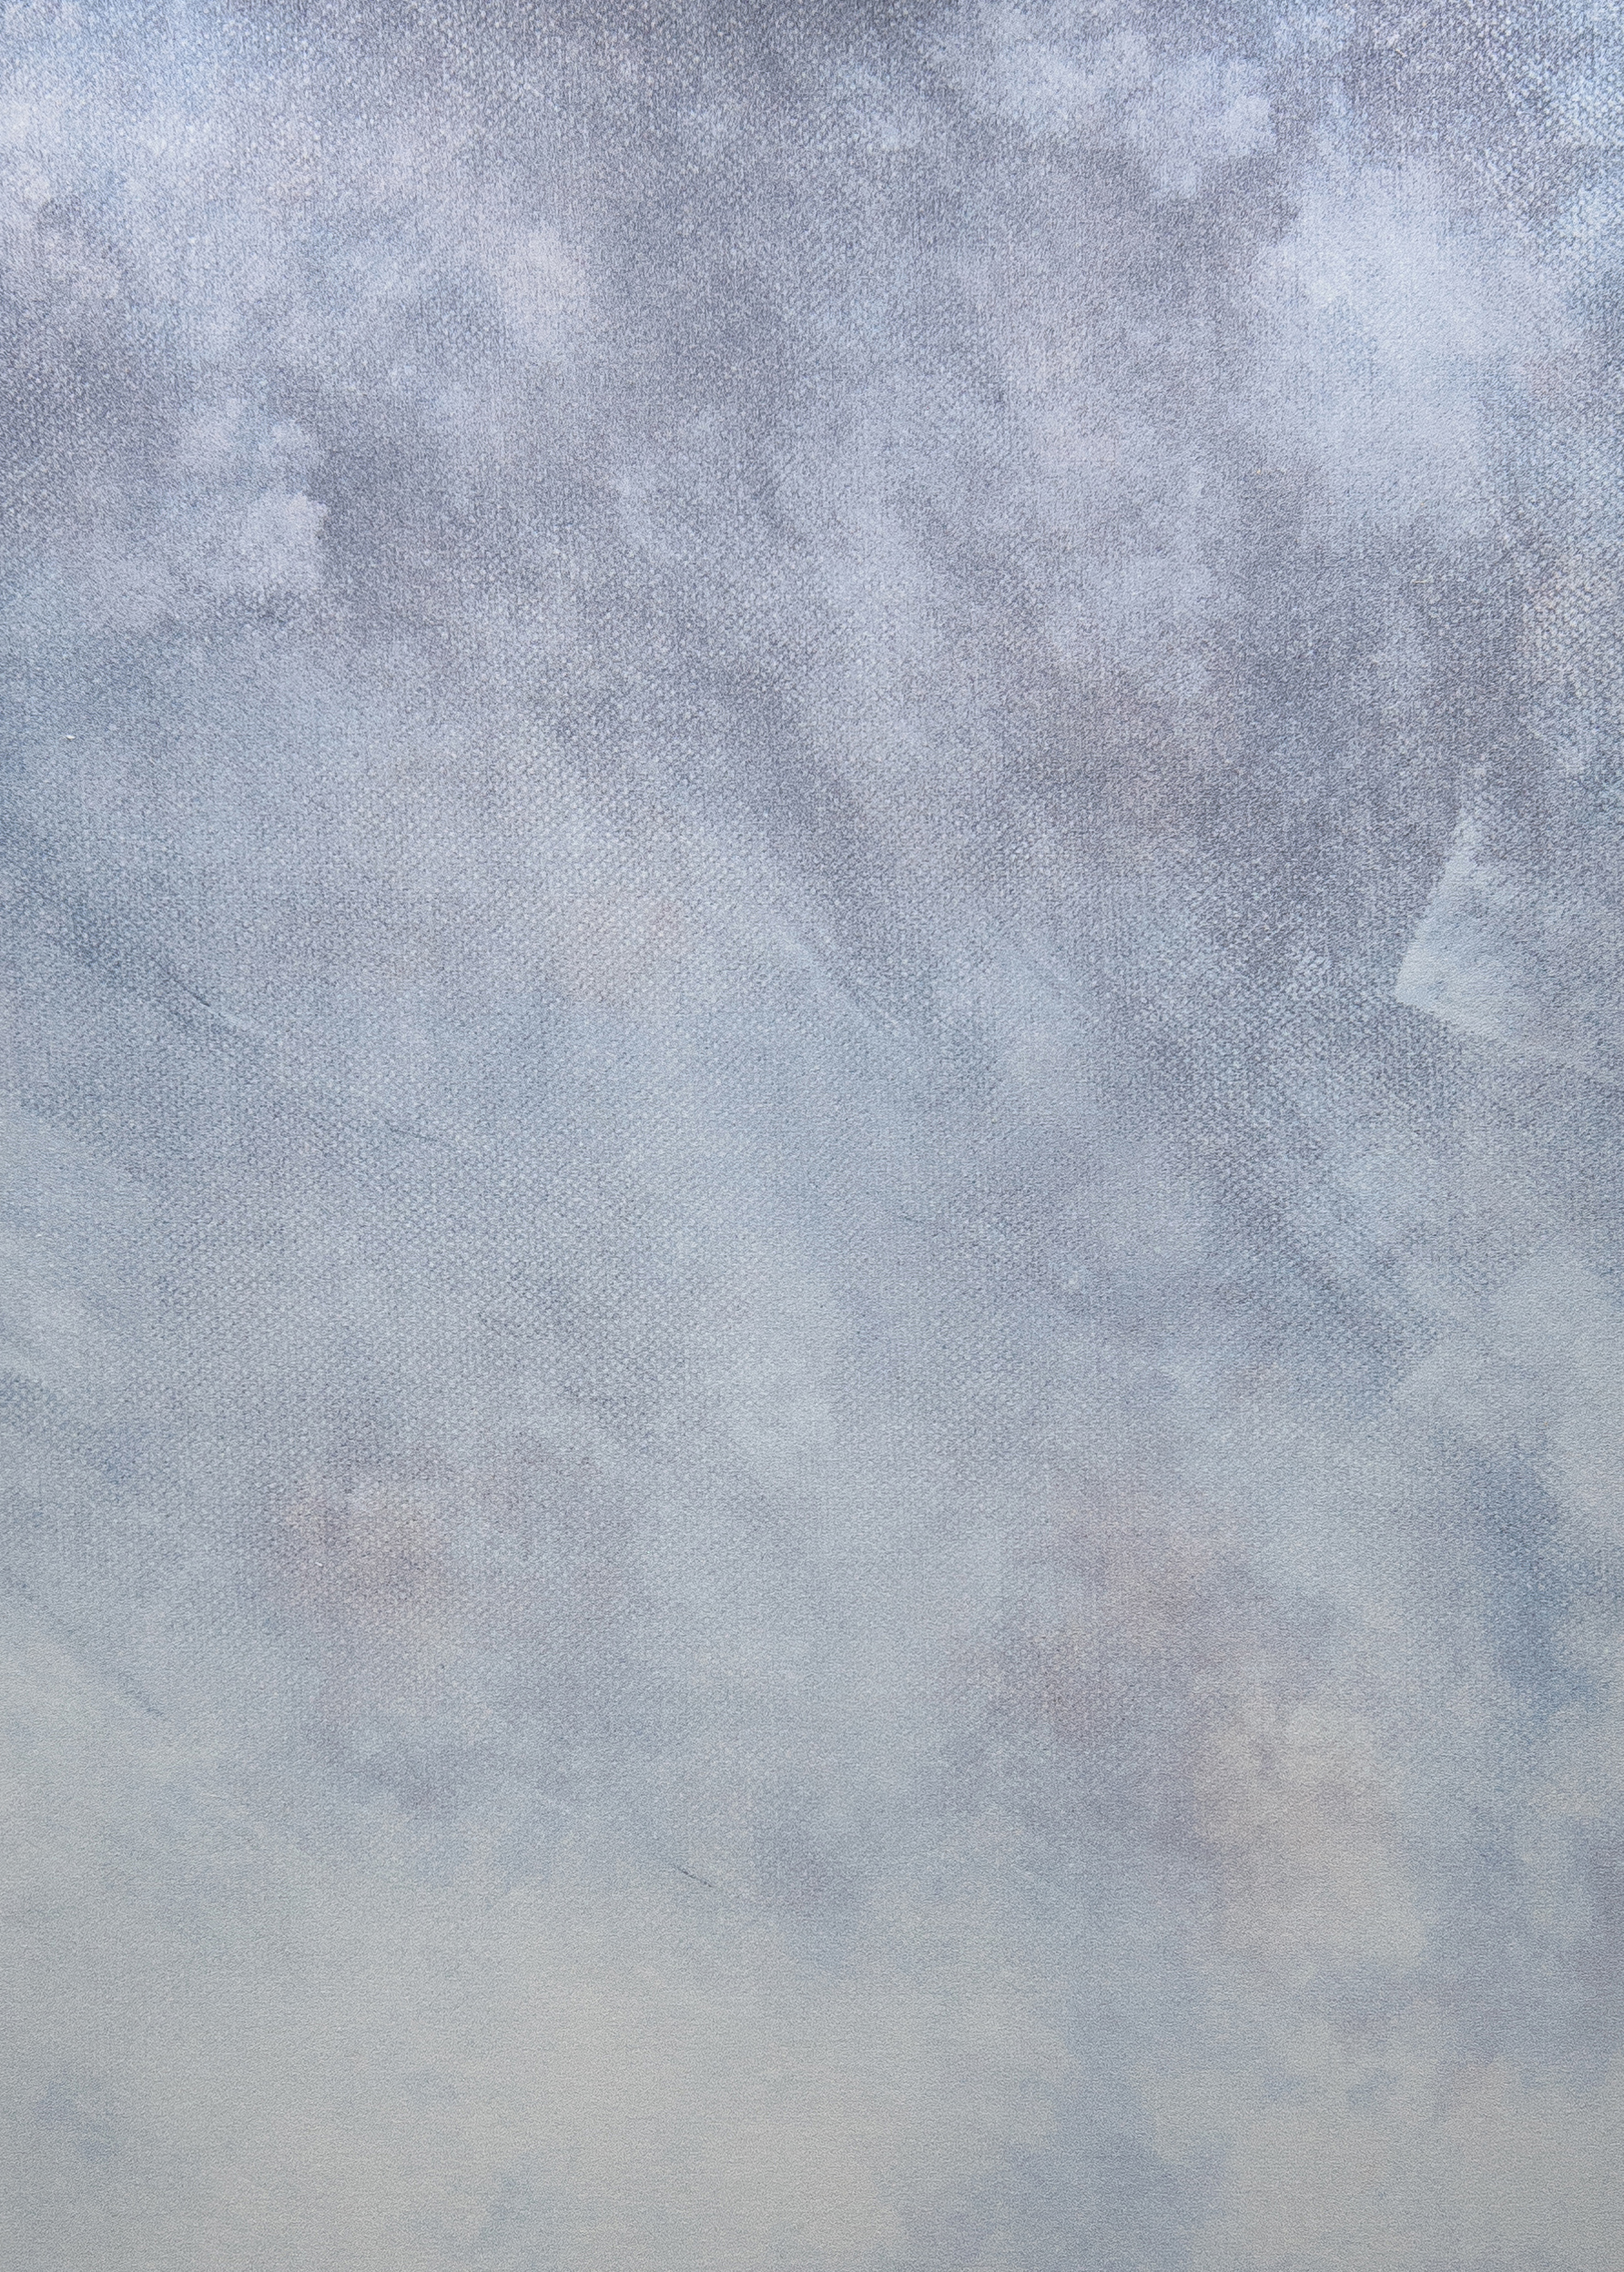 Sky Carpet Closeup.jpg